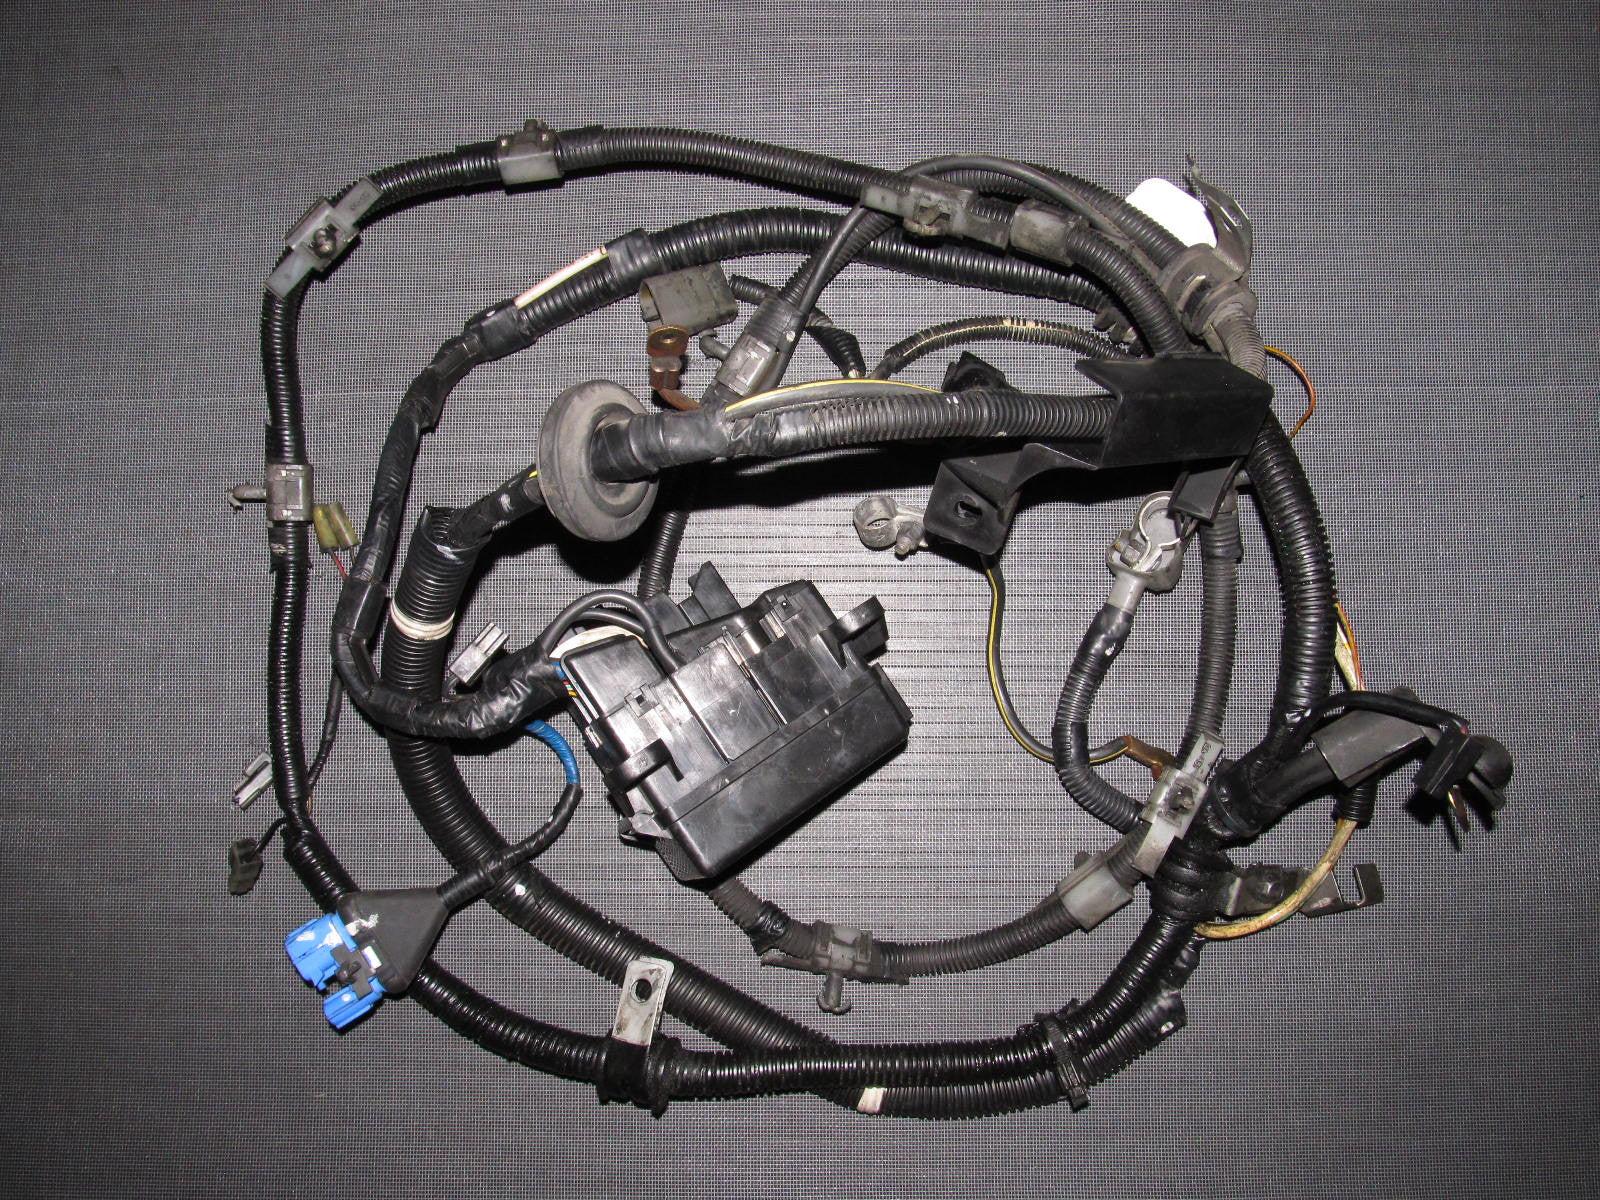 img 3740 v 1407462076 90 91 92 93 mazda miata fuse box transmission engine [ 1600 x 1200 Pixel ]